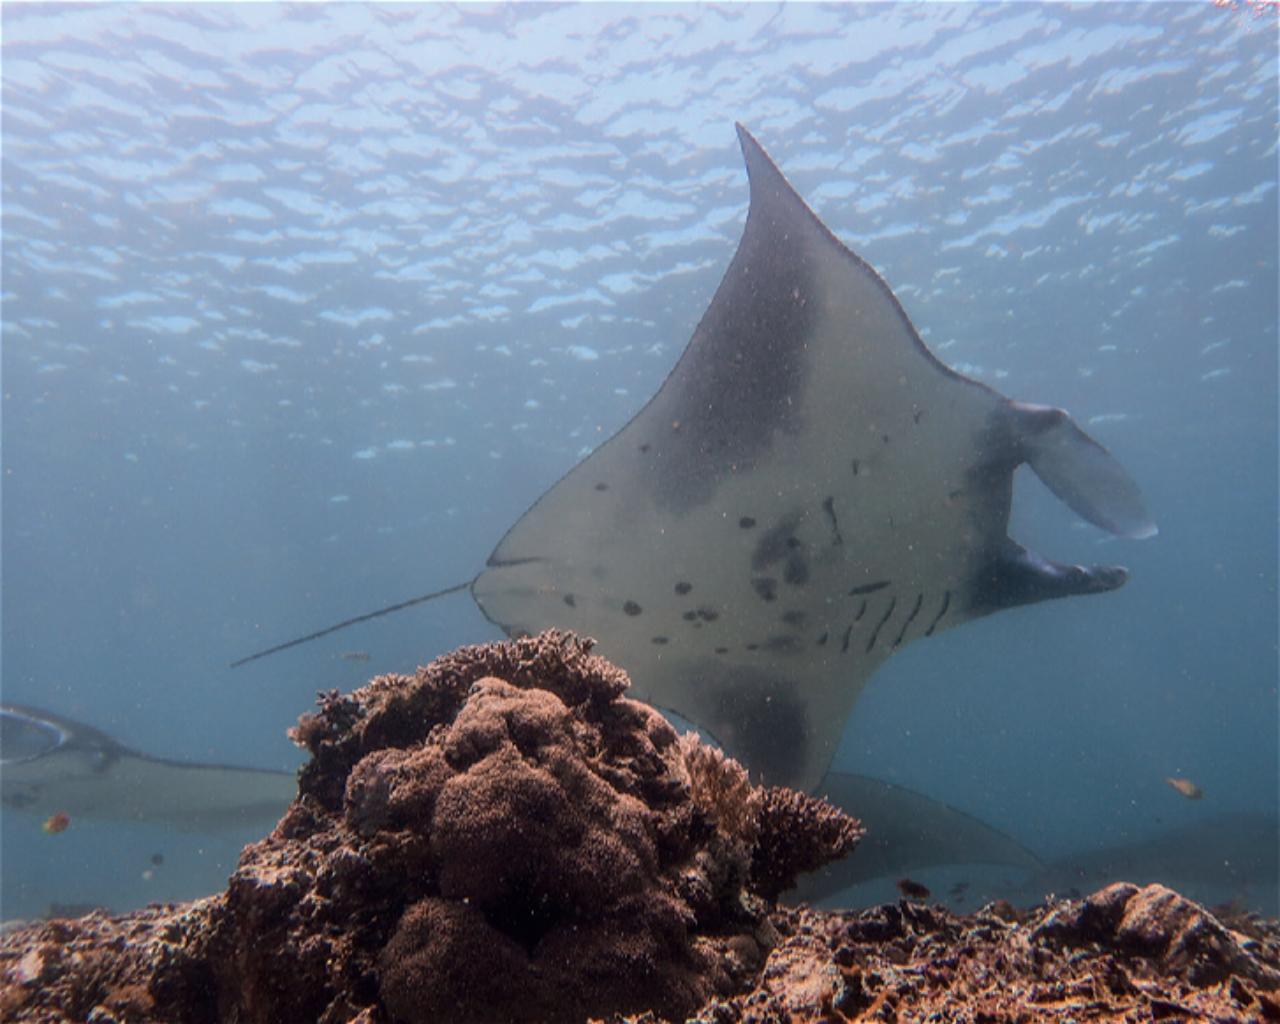 Manta Point / Makassar Reef